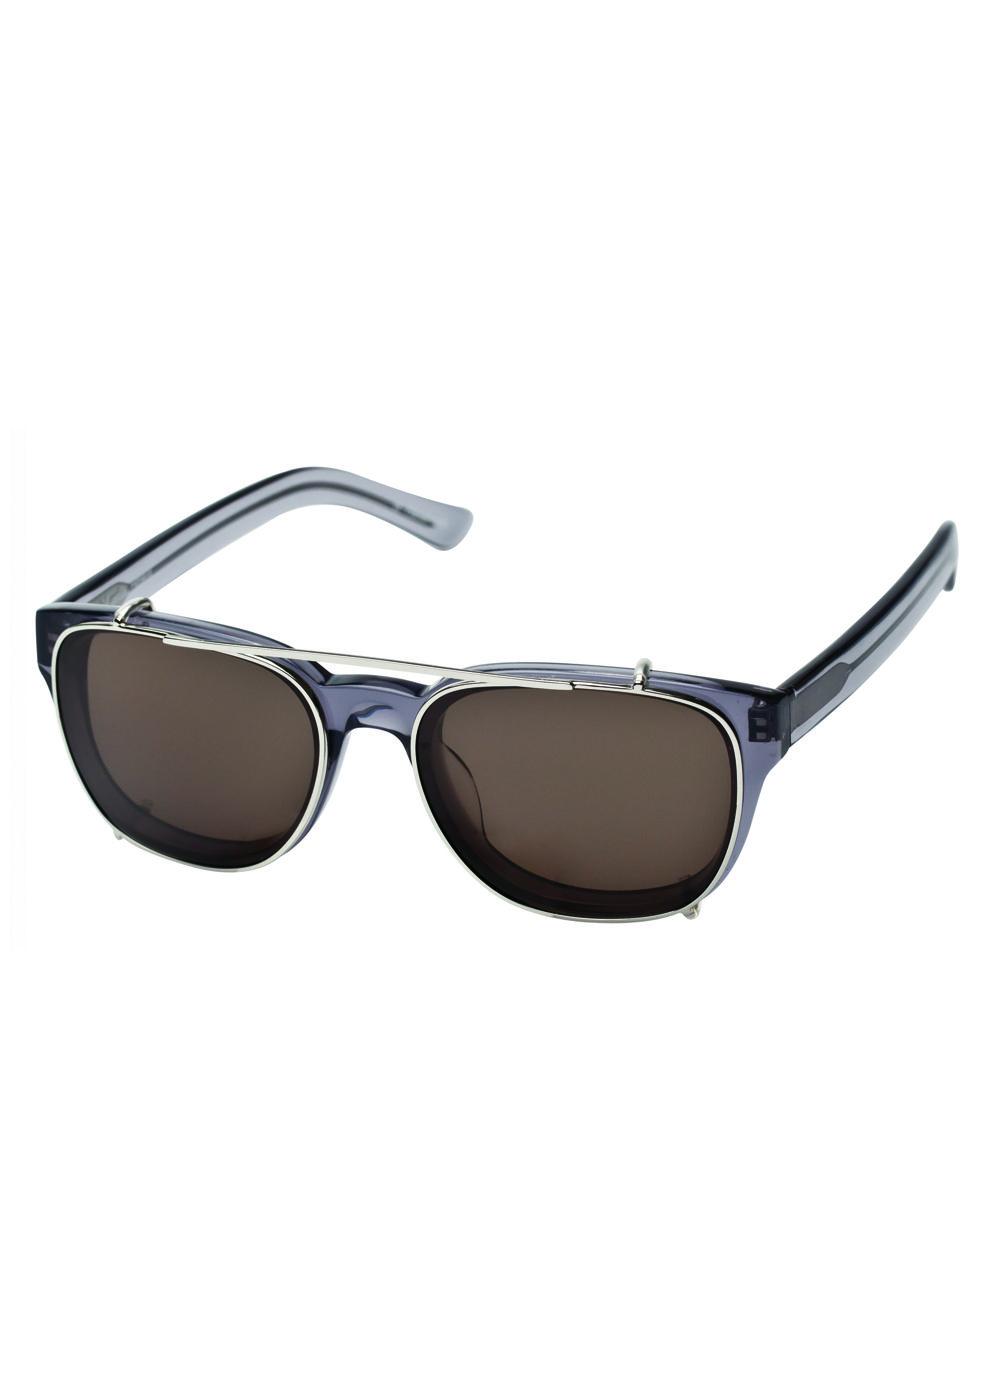 d2115bb3ca5 Ksubi Antlia Sunglasses